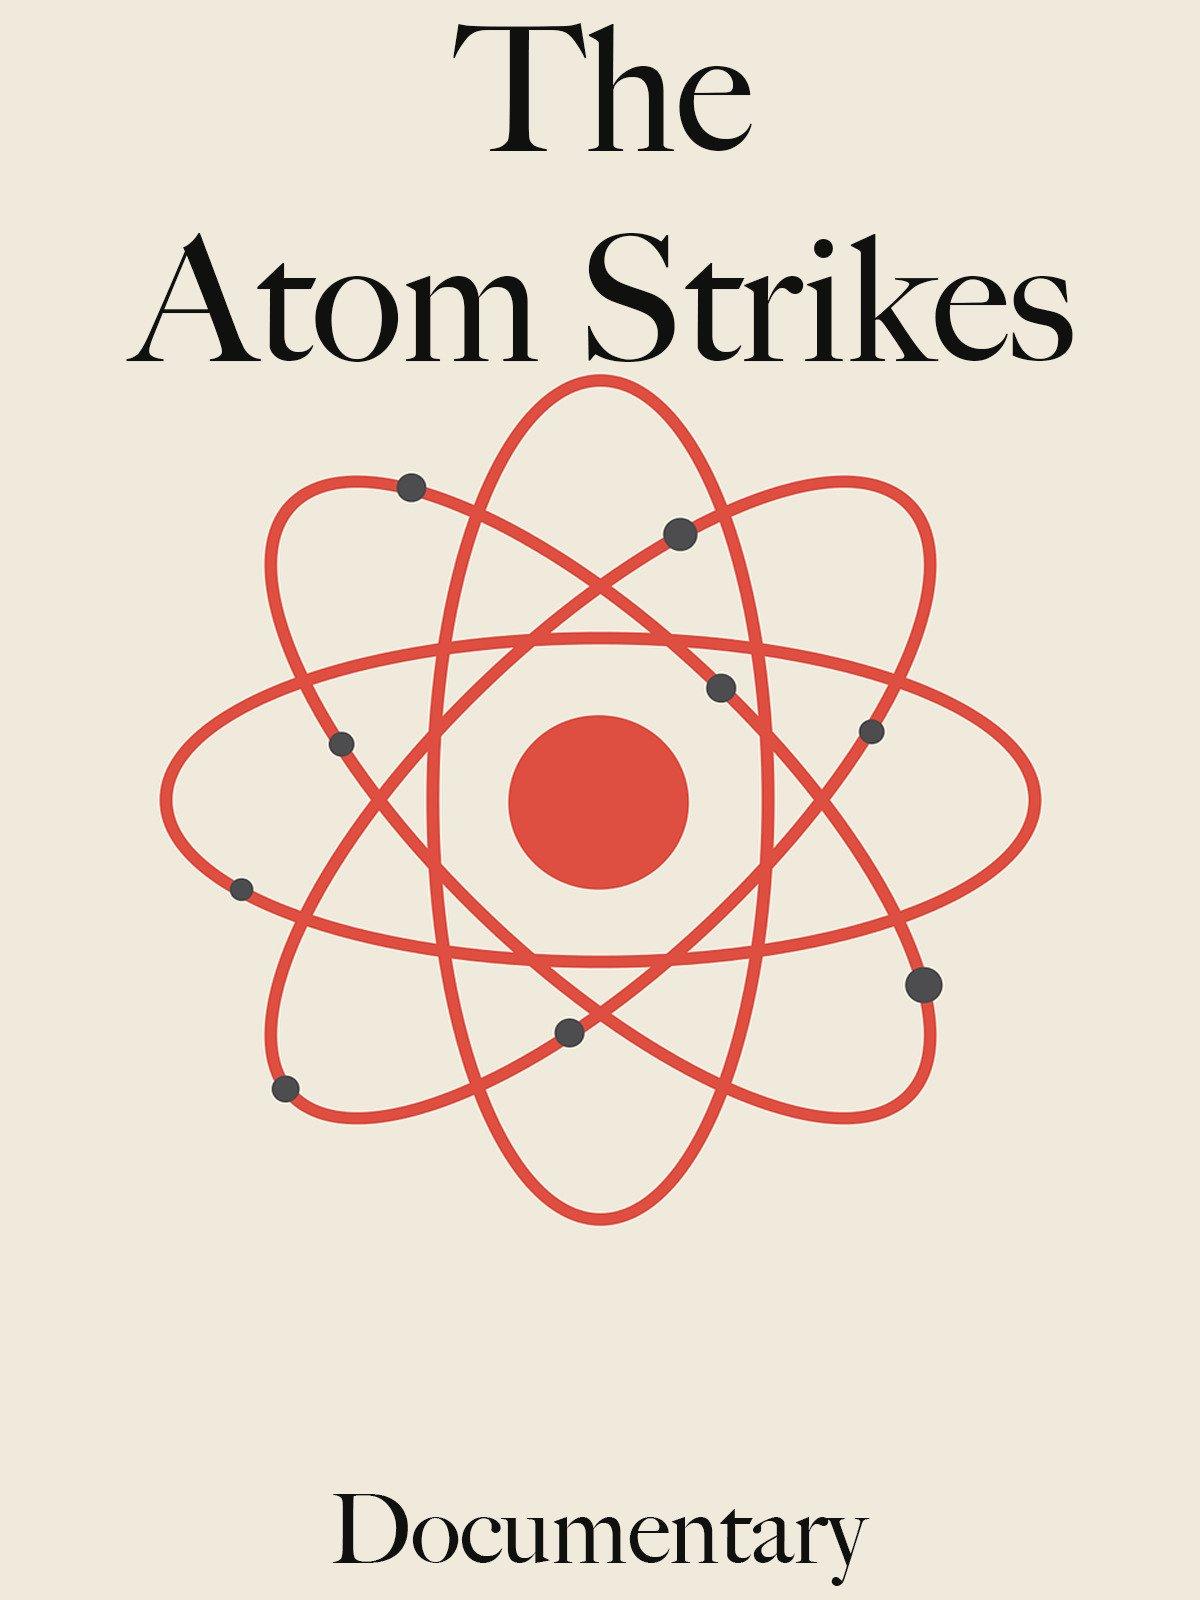 The Atom Strikes Documentary